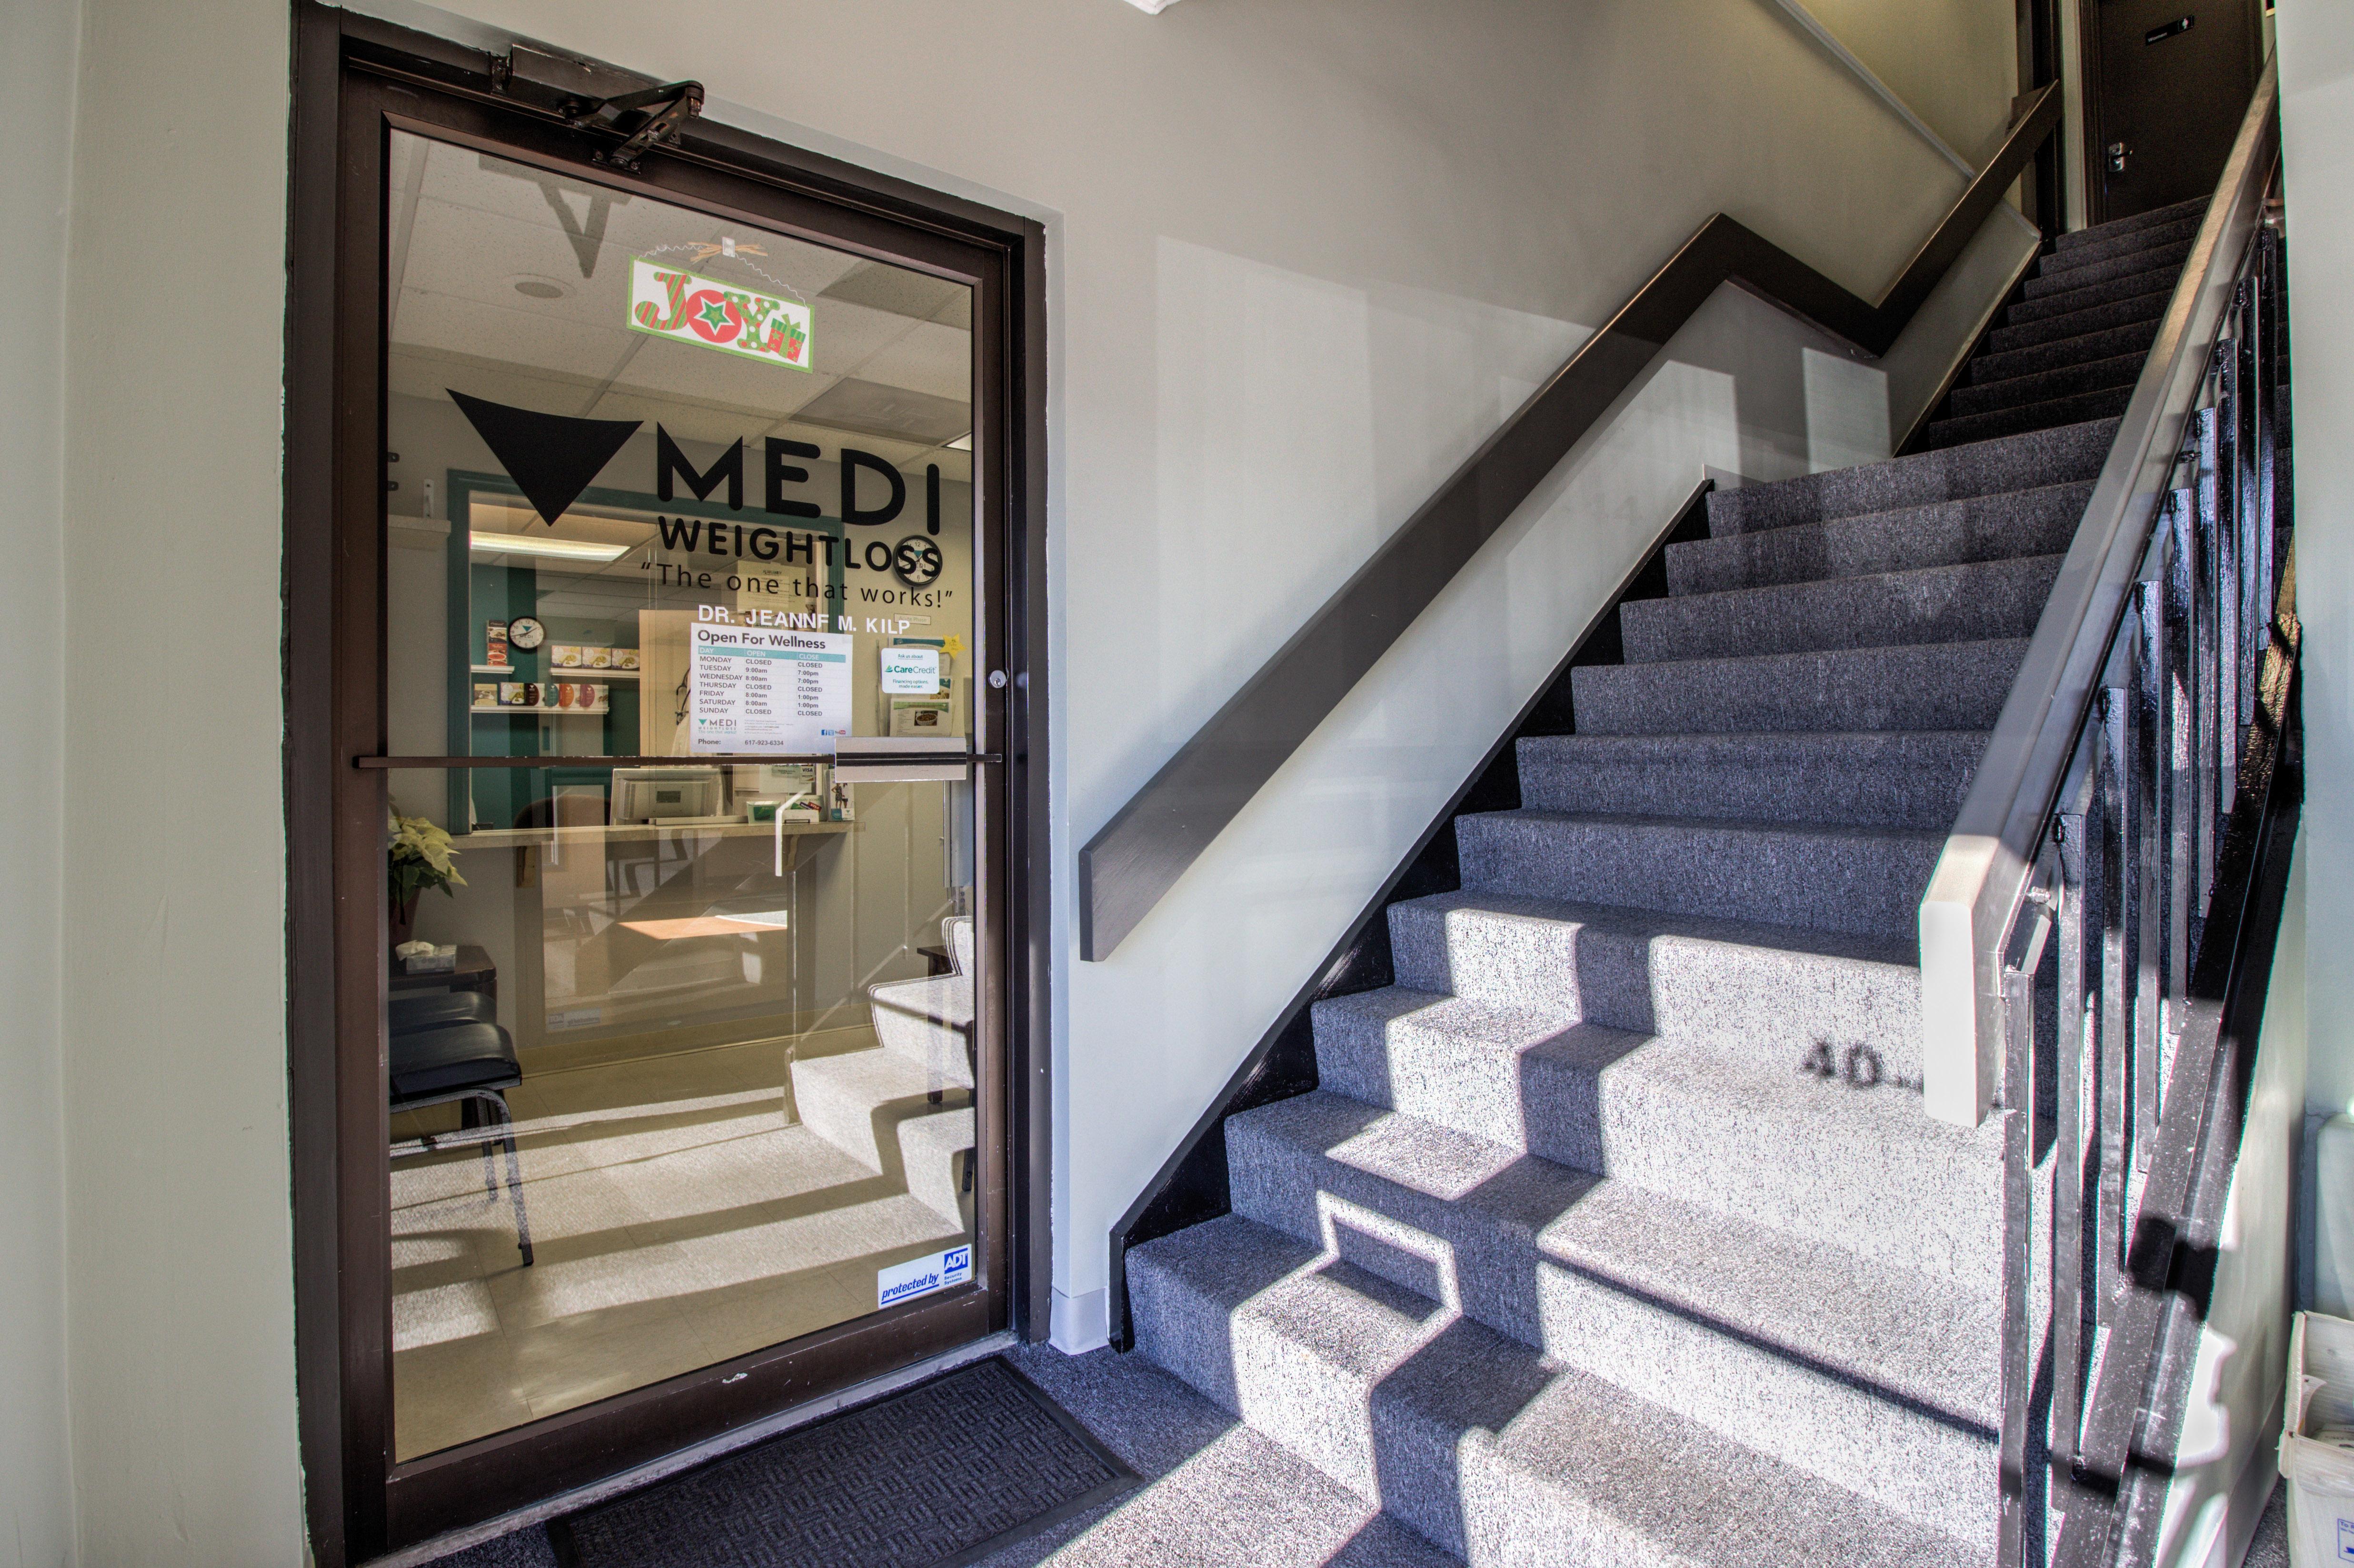 Medi-Weightloss image 10